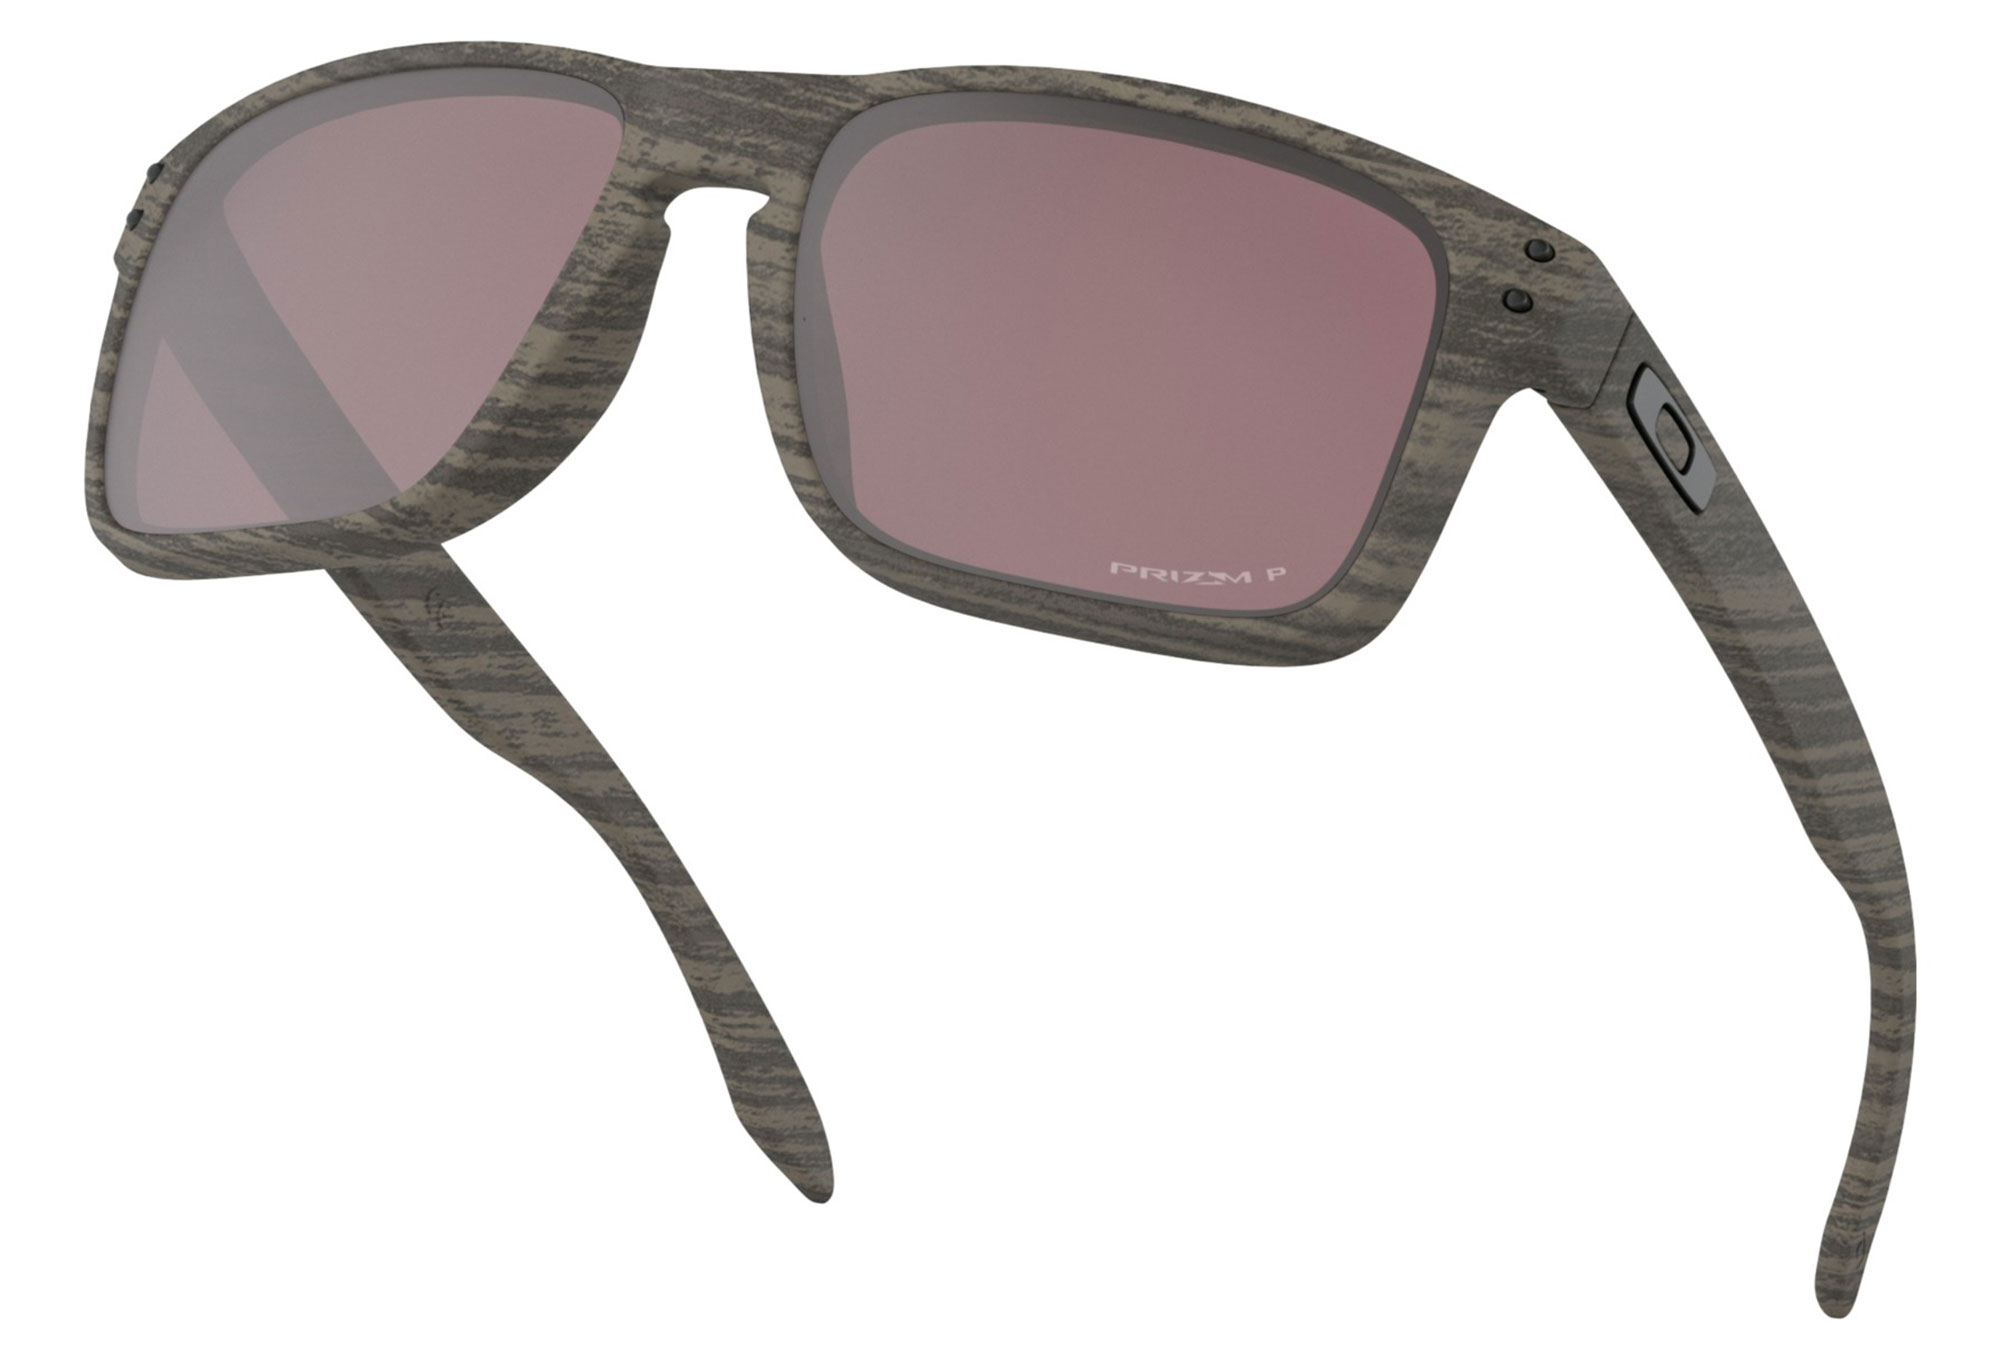 c3e7d06907 Oakley Holbrook Woodgrain Collection Sunglasses Woodgrain - Prizm Daily  Polarized OO9102-B7